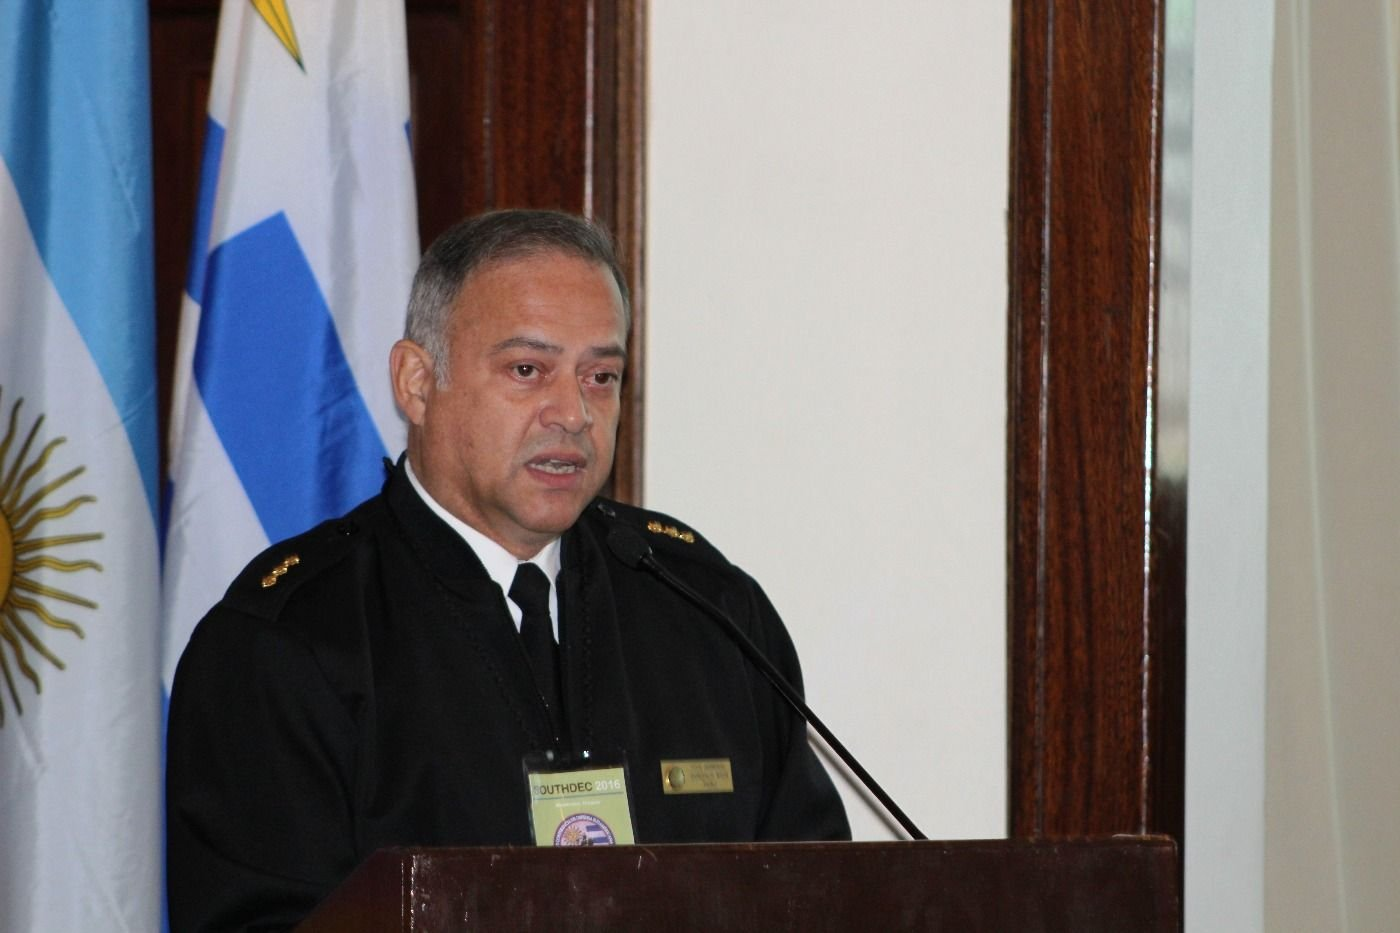 The Inter-American Defense Board in the Western Hemisphere